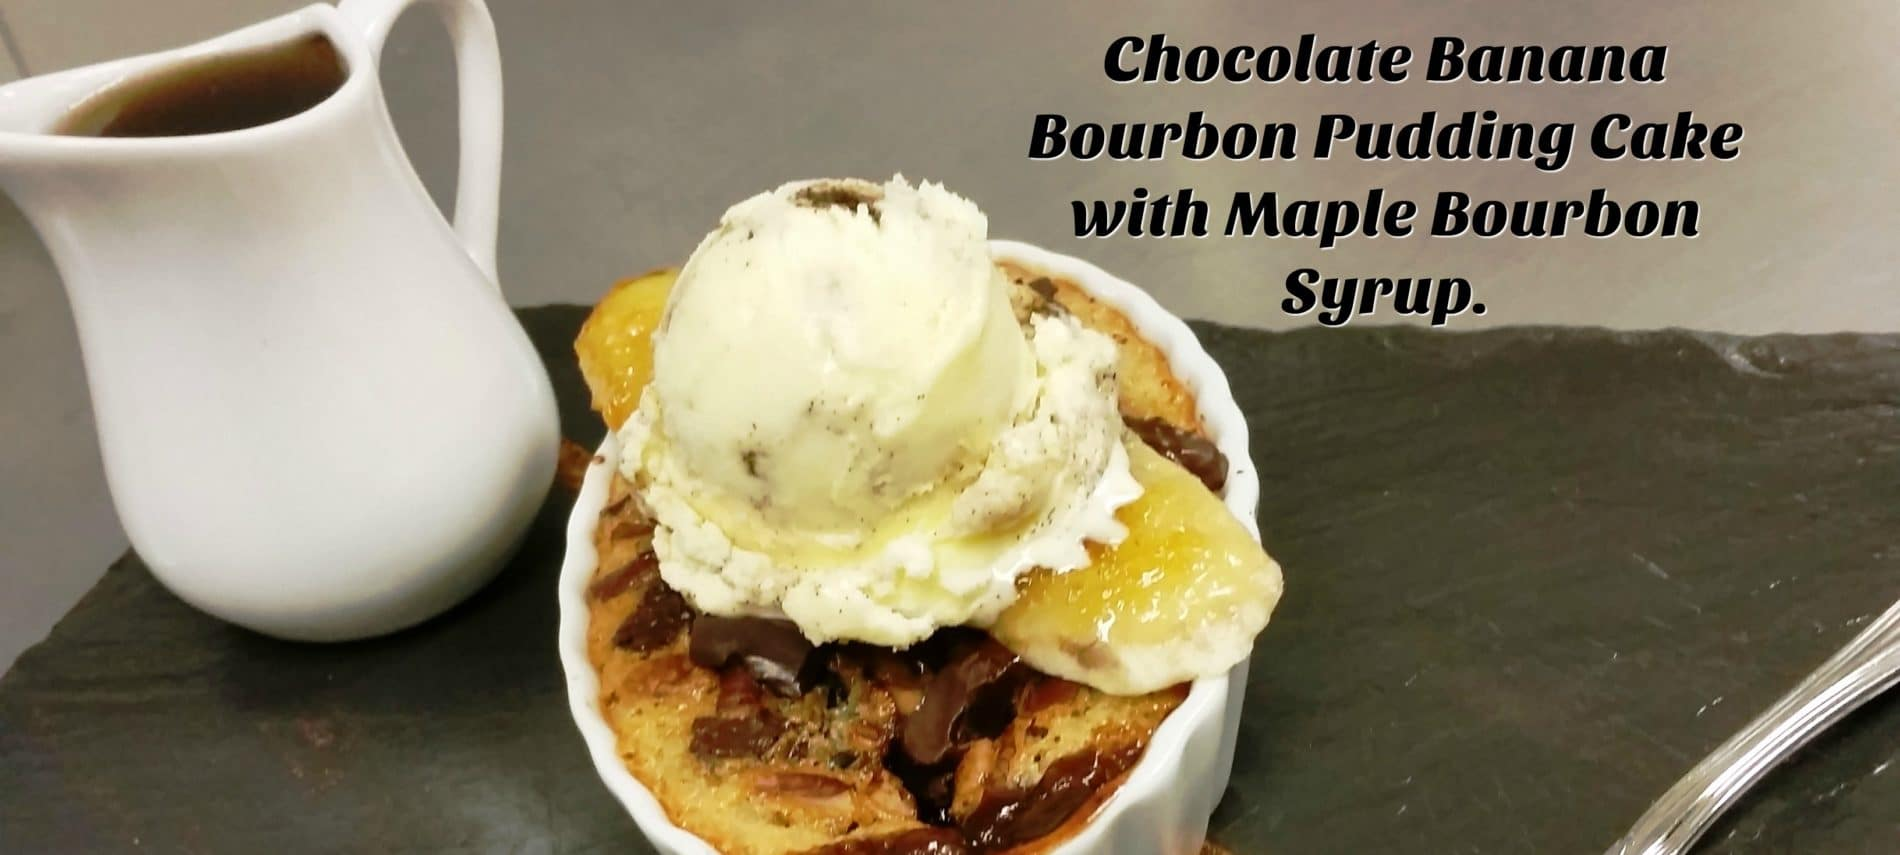 Chocolate Banana Bourbon Pudding cake recipe from Rabbit Hill Inn